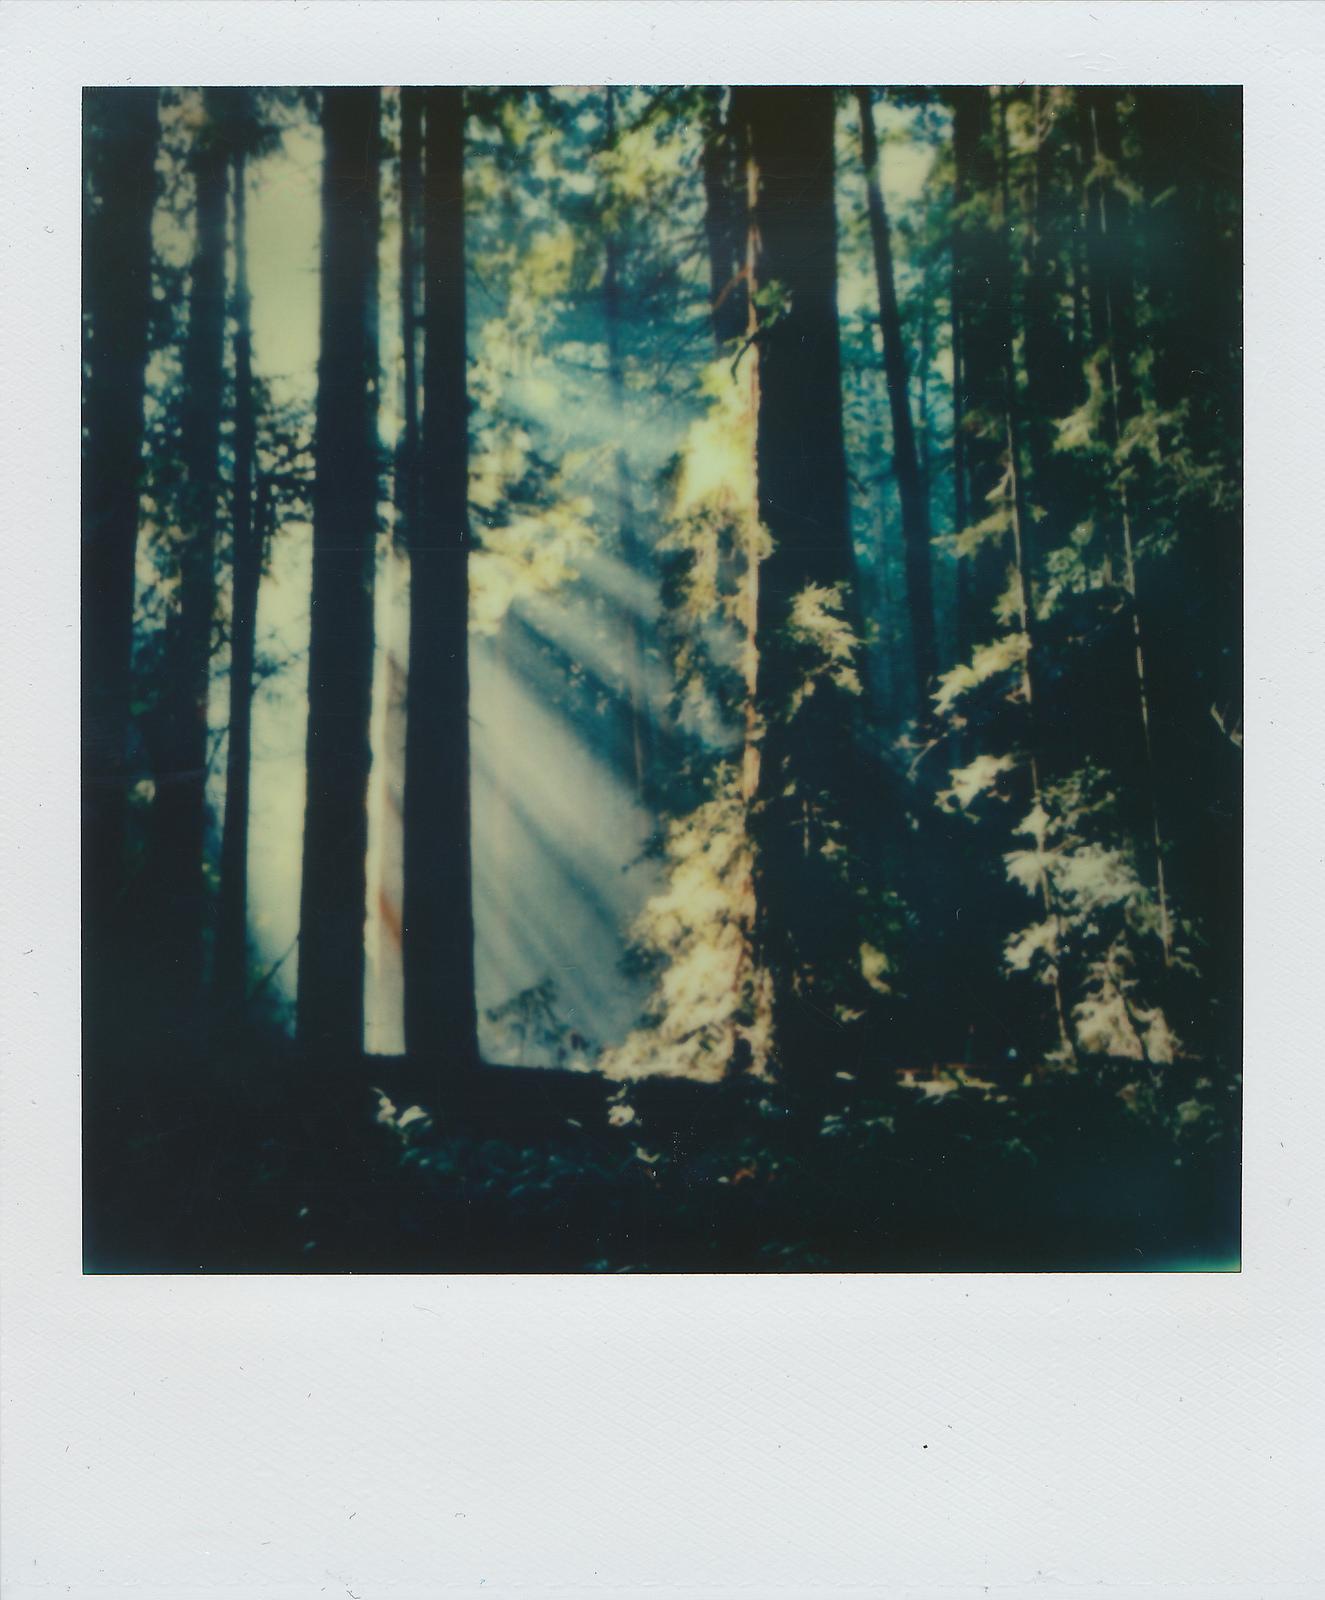 """Muir Woods"" by  Nicholas Misciagna"